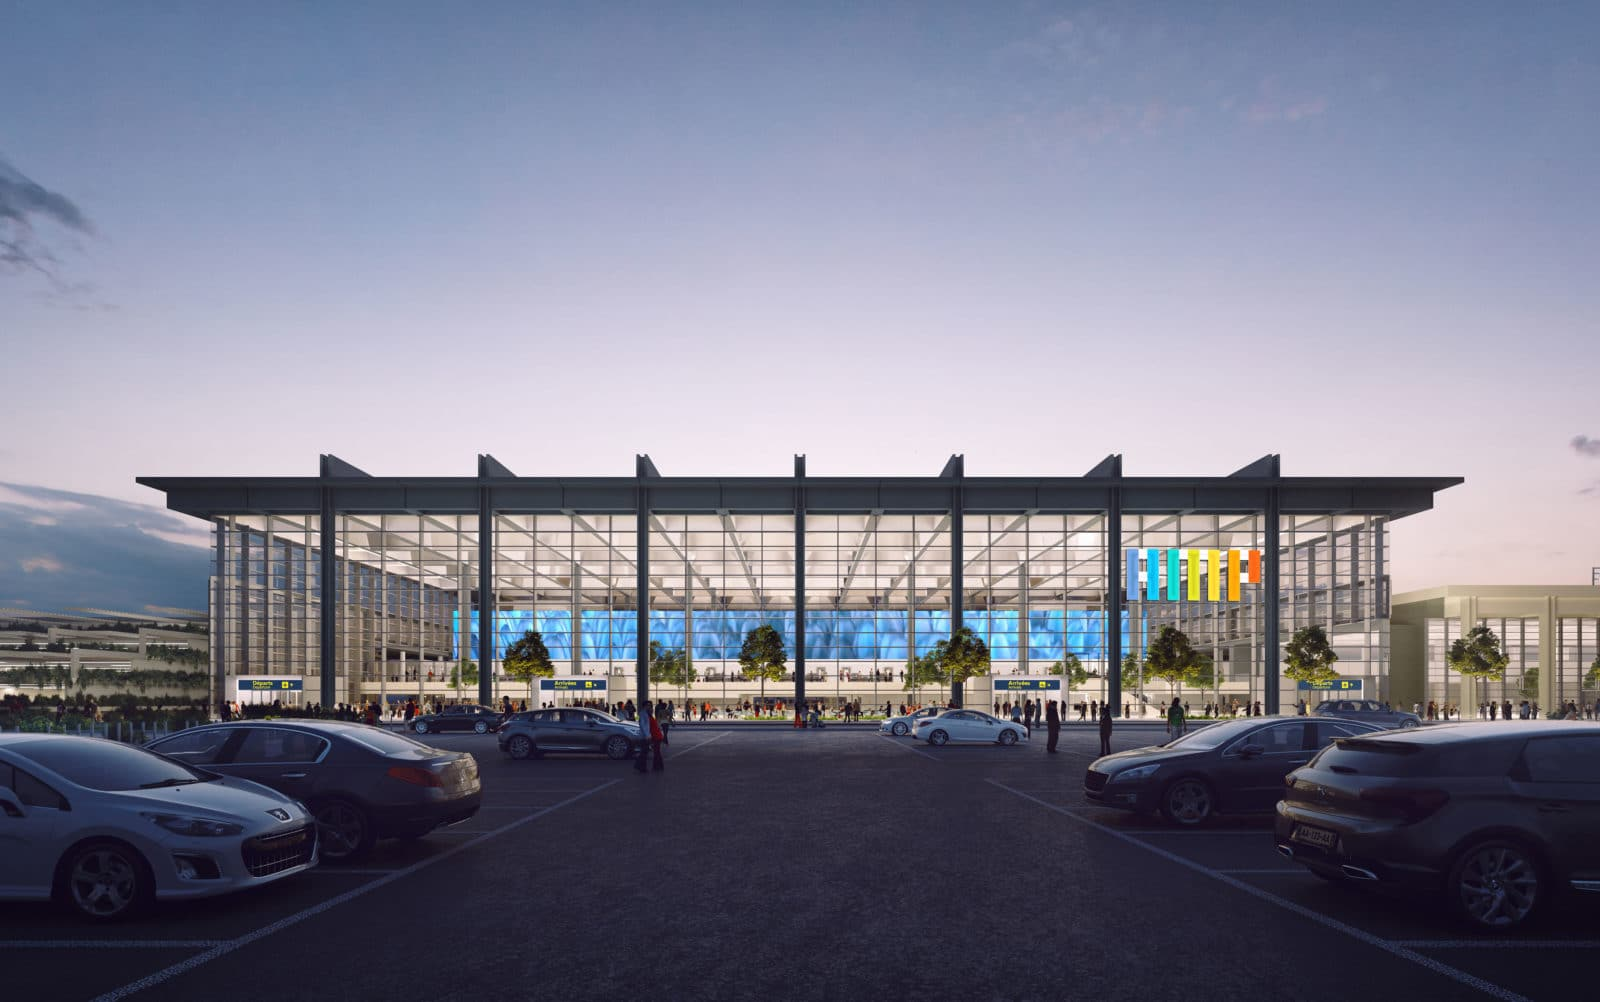 aeroport marseille extension foster 4